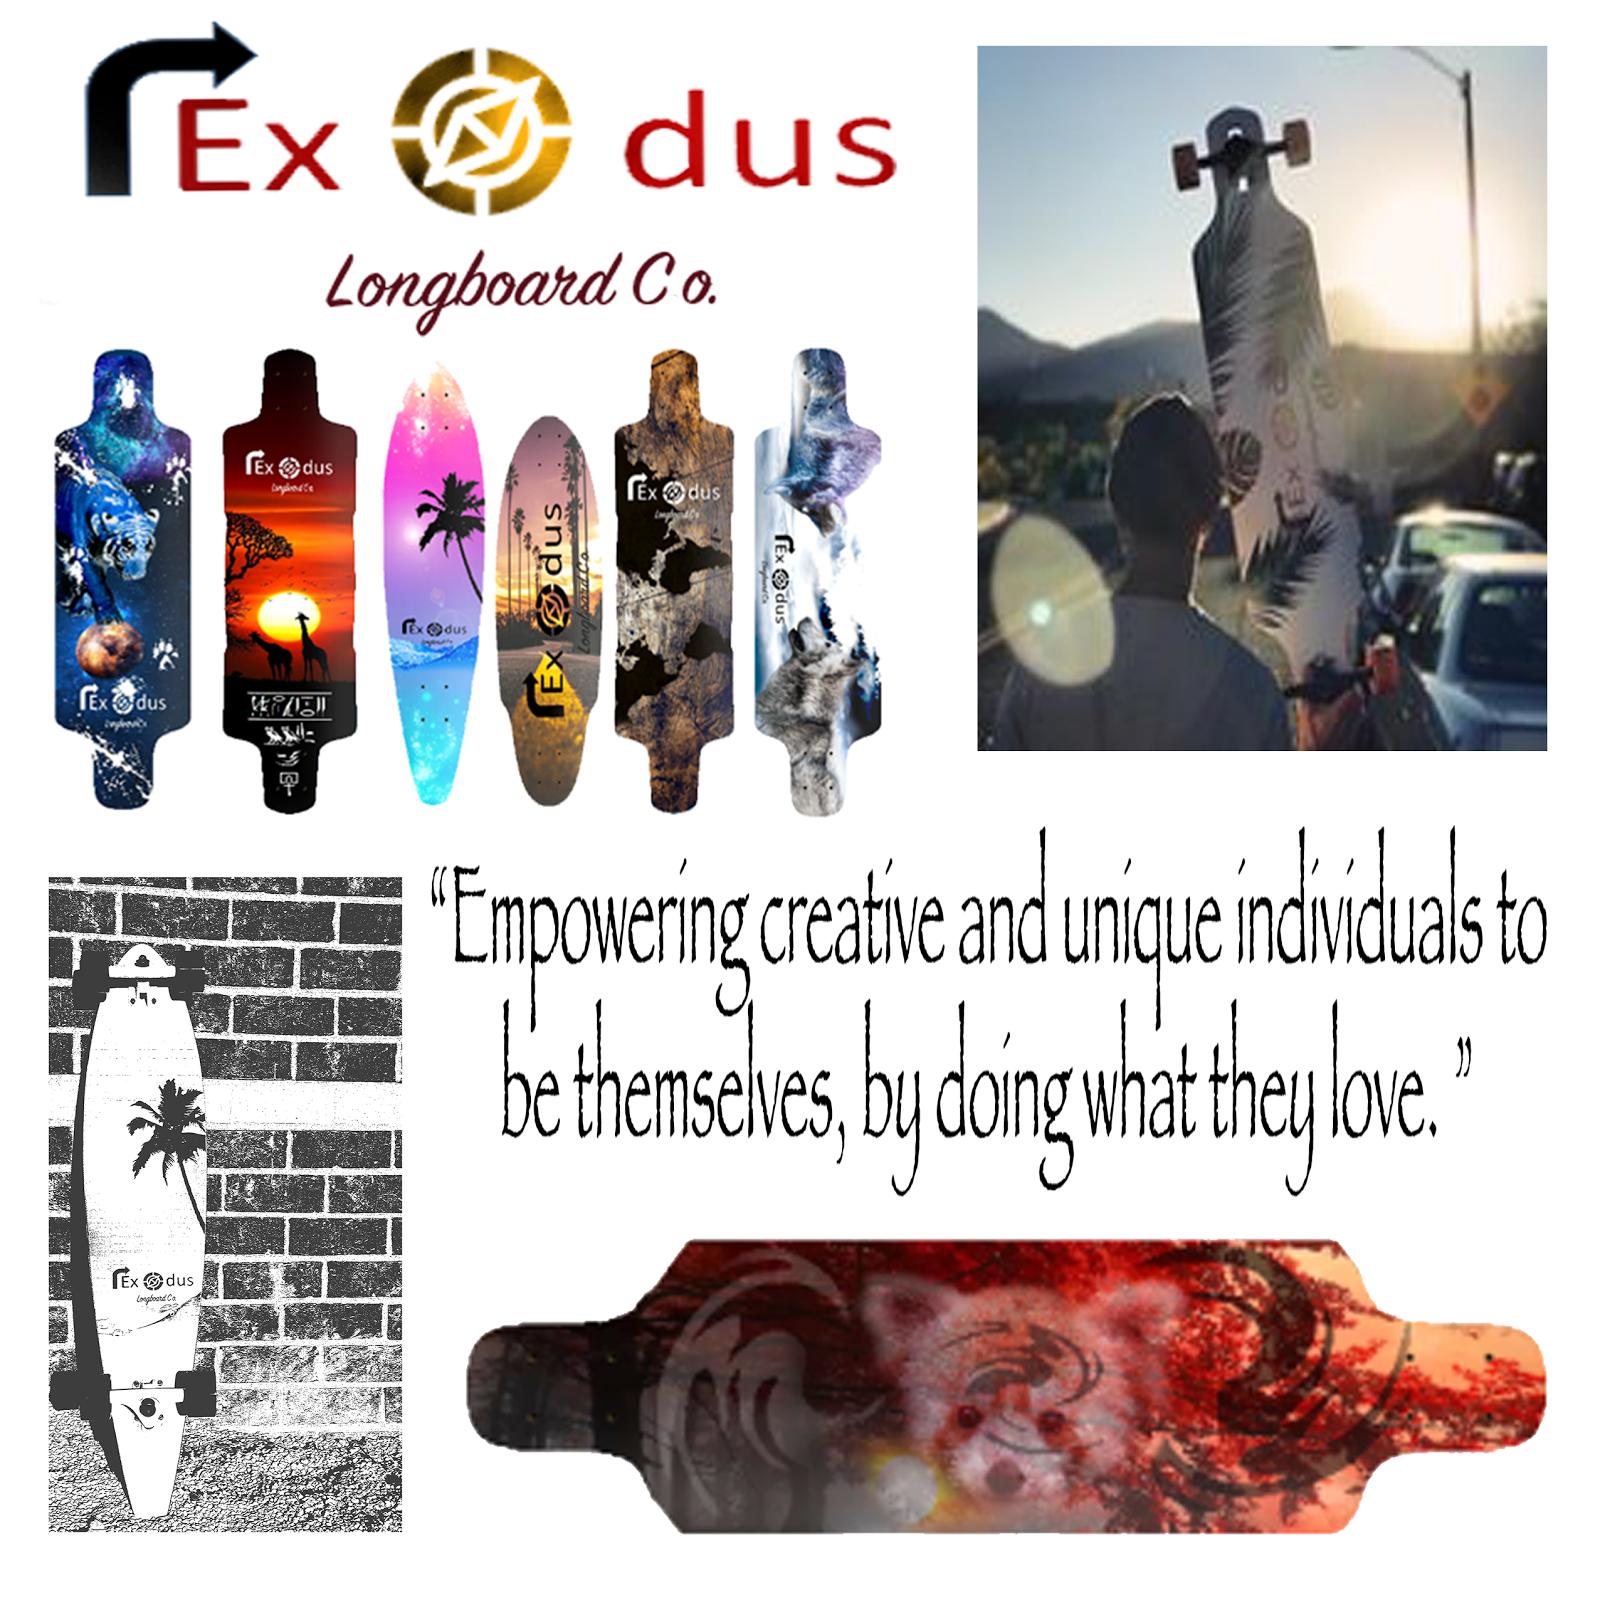 Exodus Longboard Company